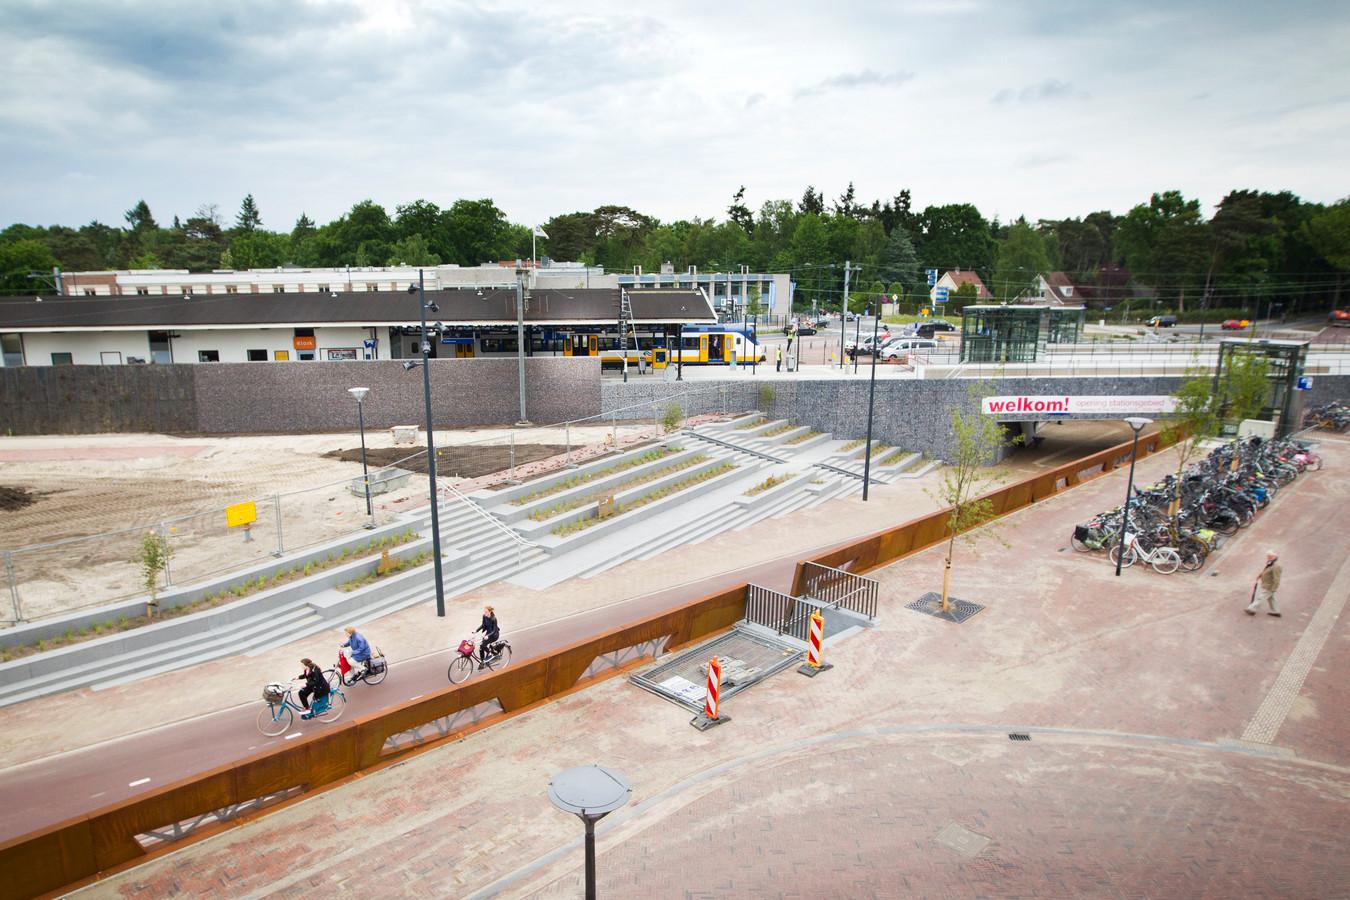 Station Bilthoven.